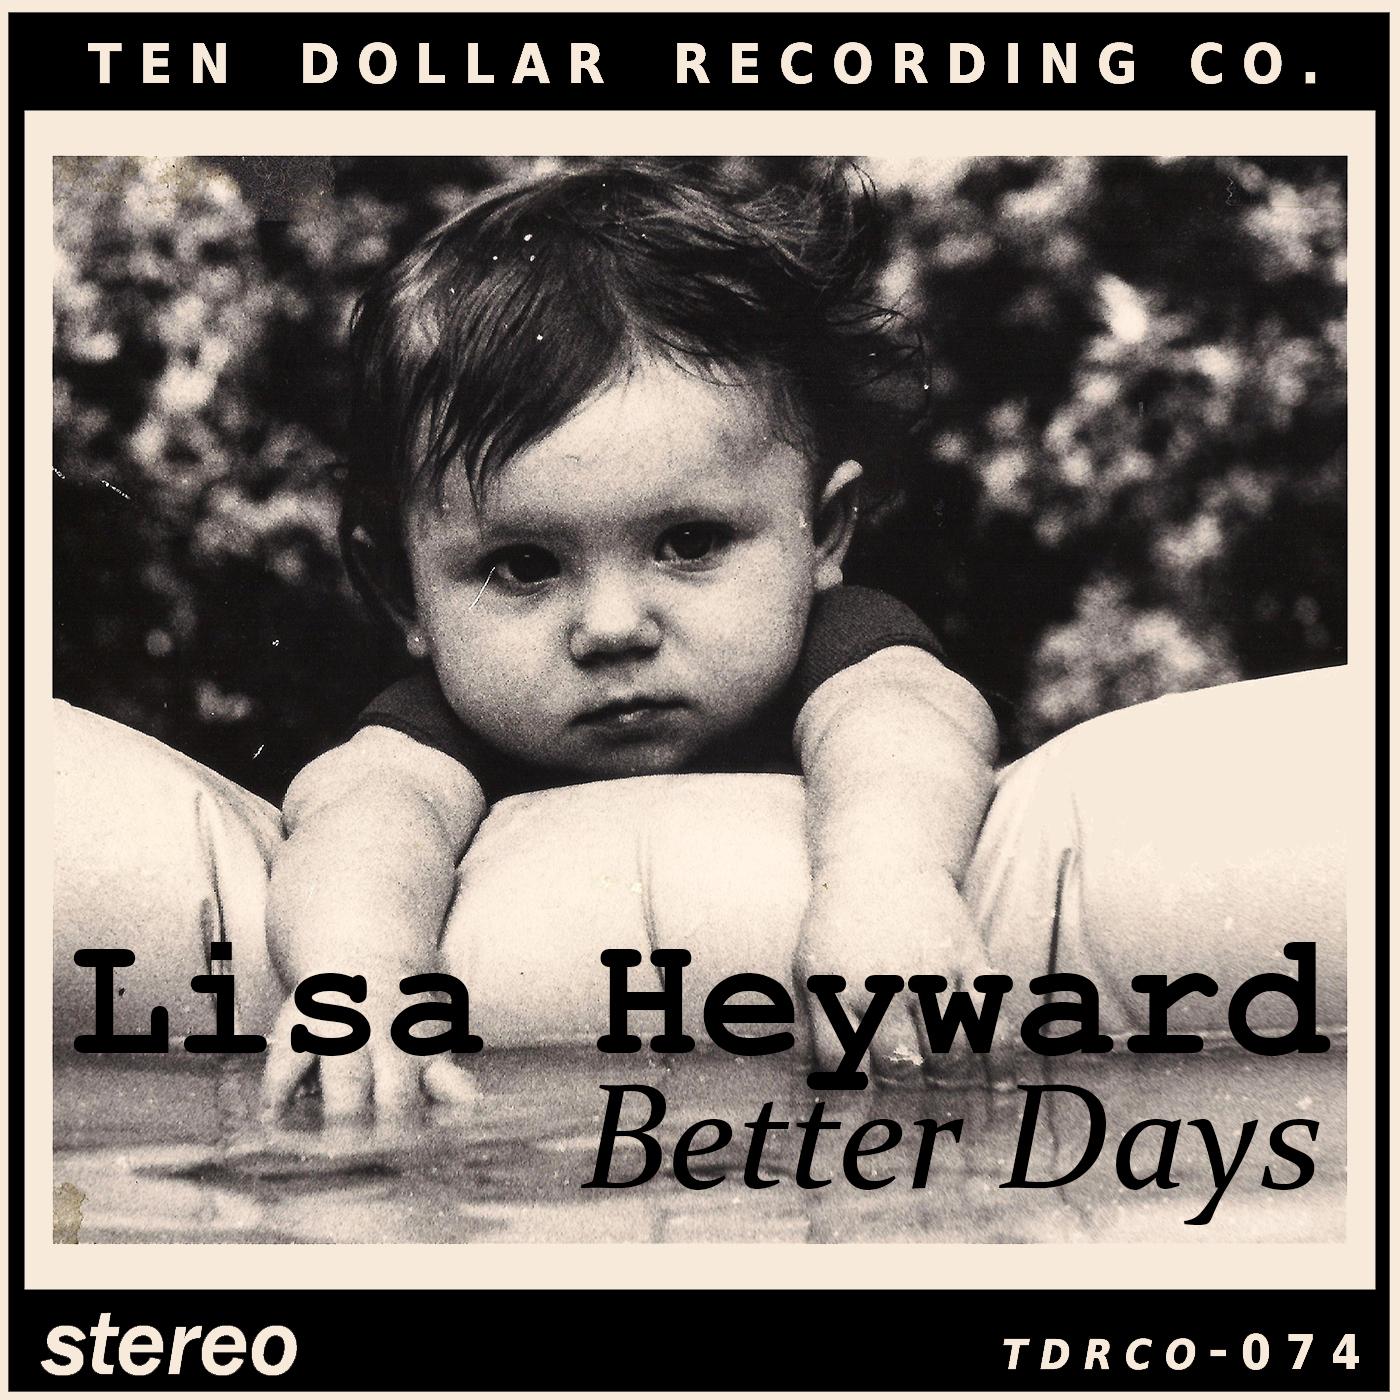 Lisa Heyward - Better Days (Single)